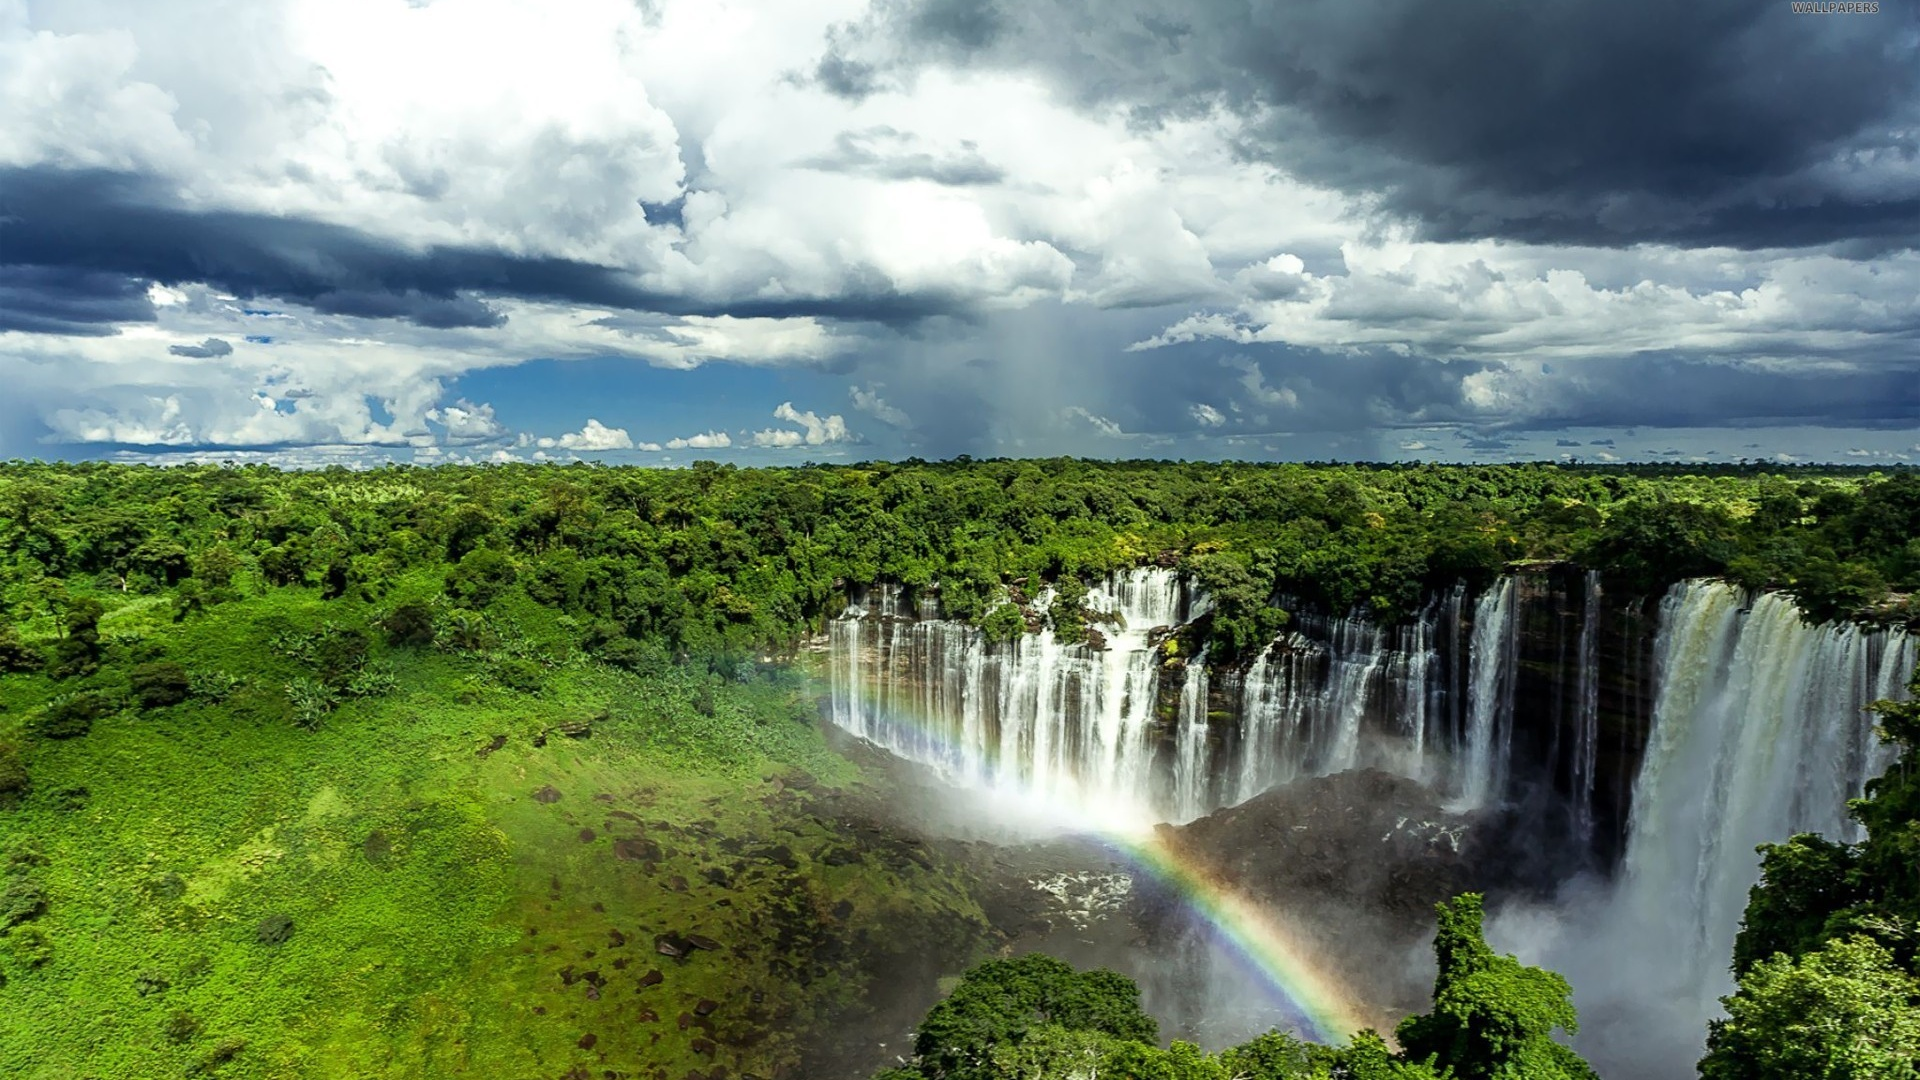 1920x1080-Kalandula-Falls-Angola-Africa-desktop-PC-and-Mac-wallpaper-wp340862